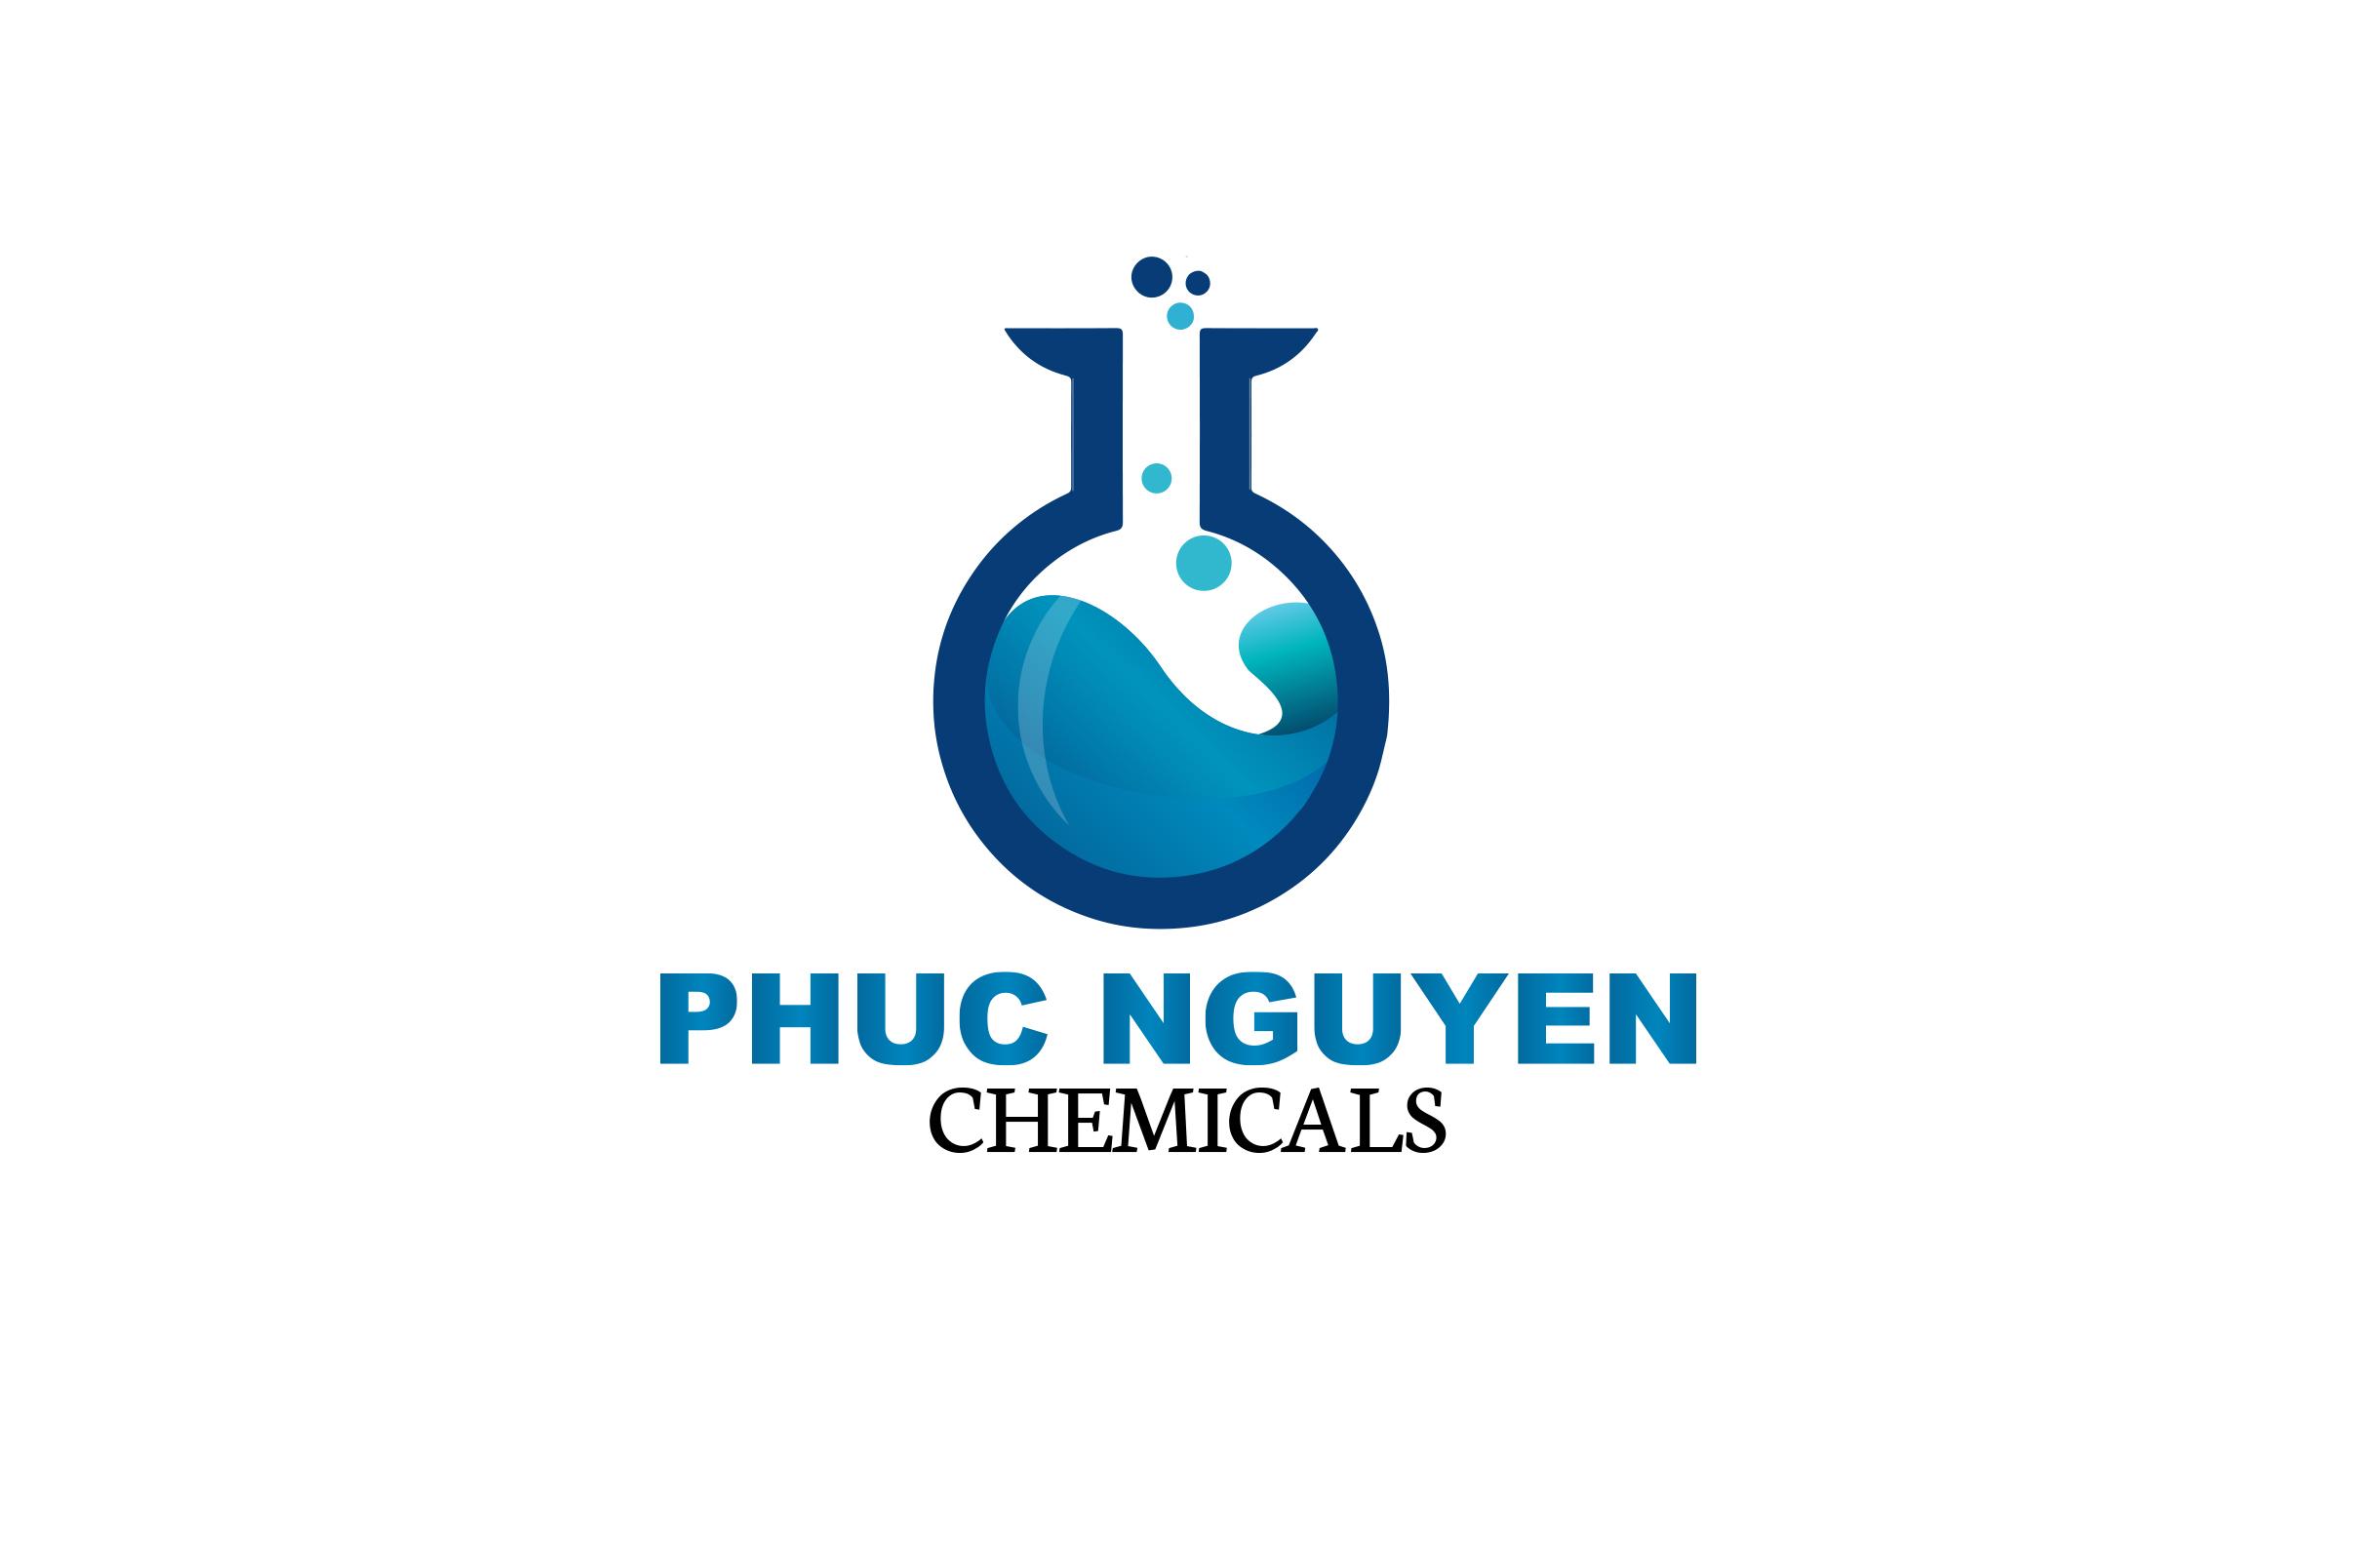 PHUC NGUYEN CHEMICALS